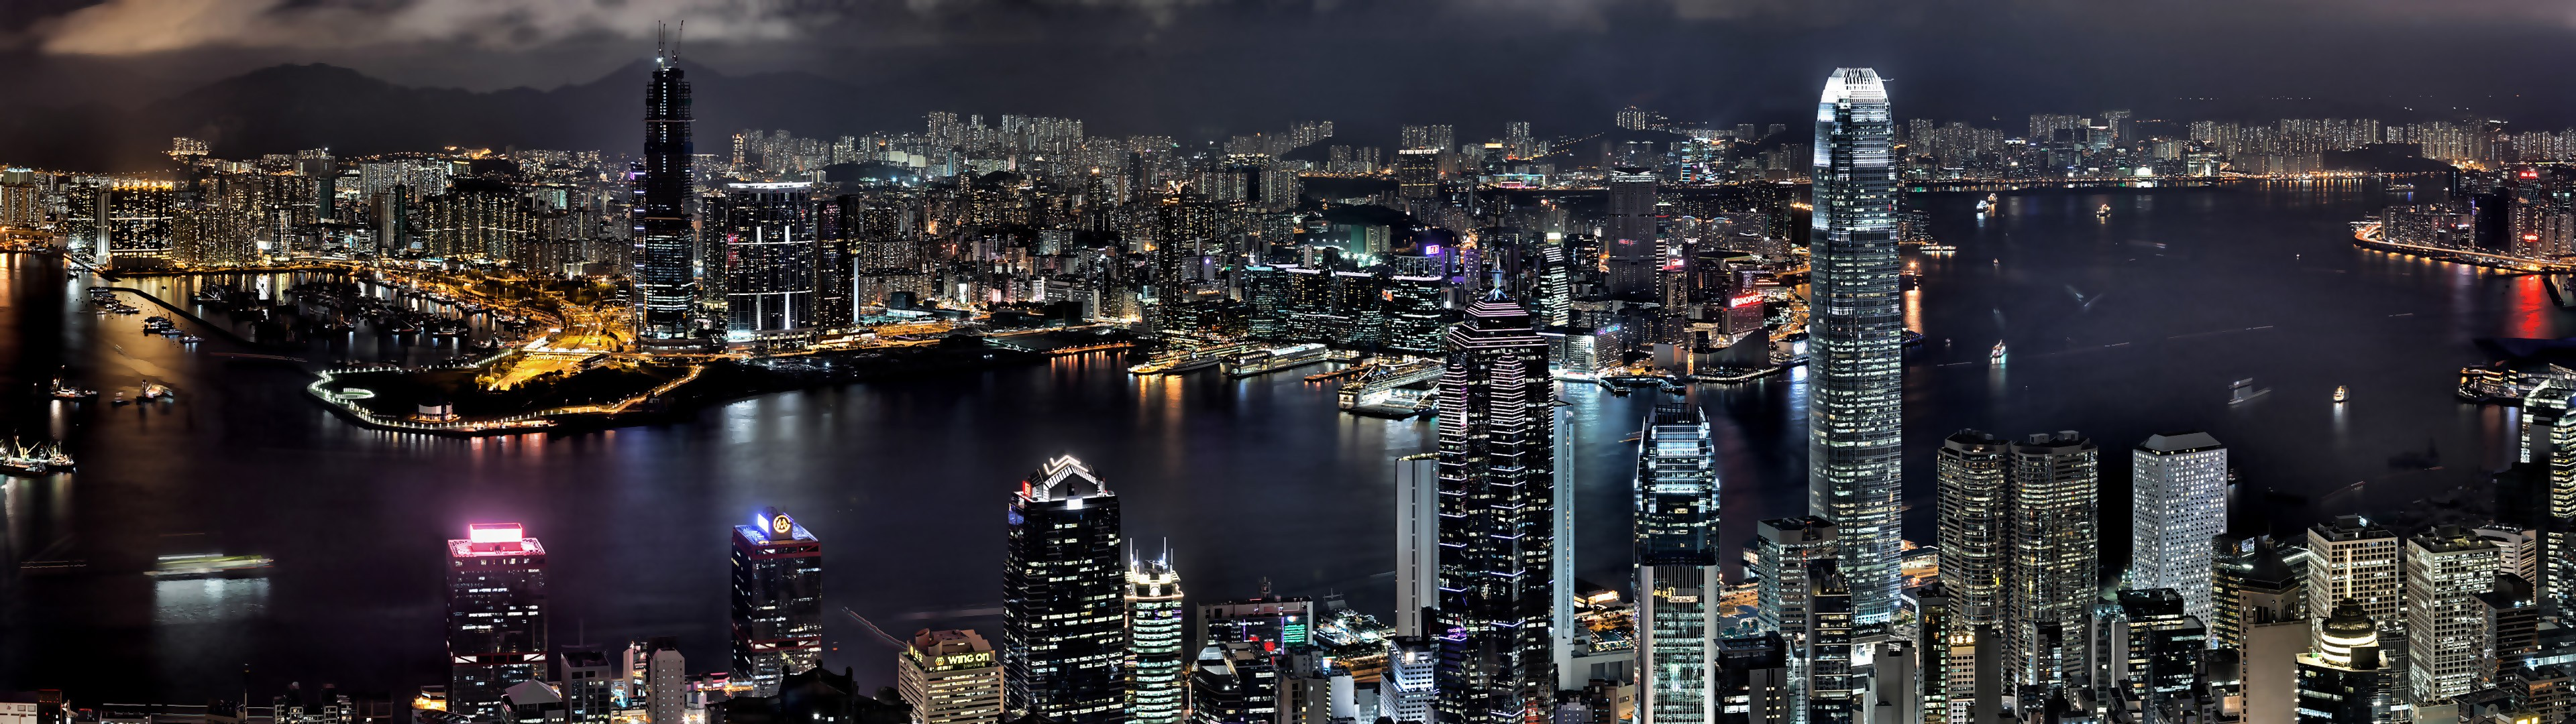 General 3840x1080 city cityscape Hong Kong night HDR China Asia city lights aerial view